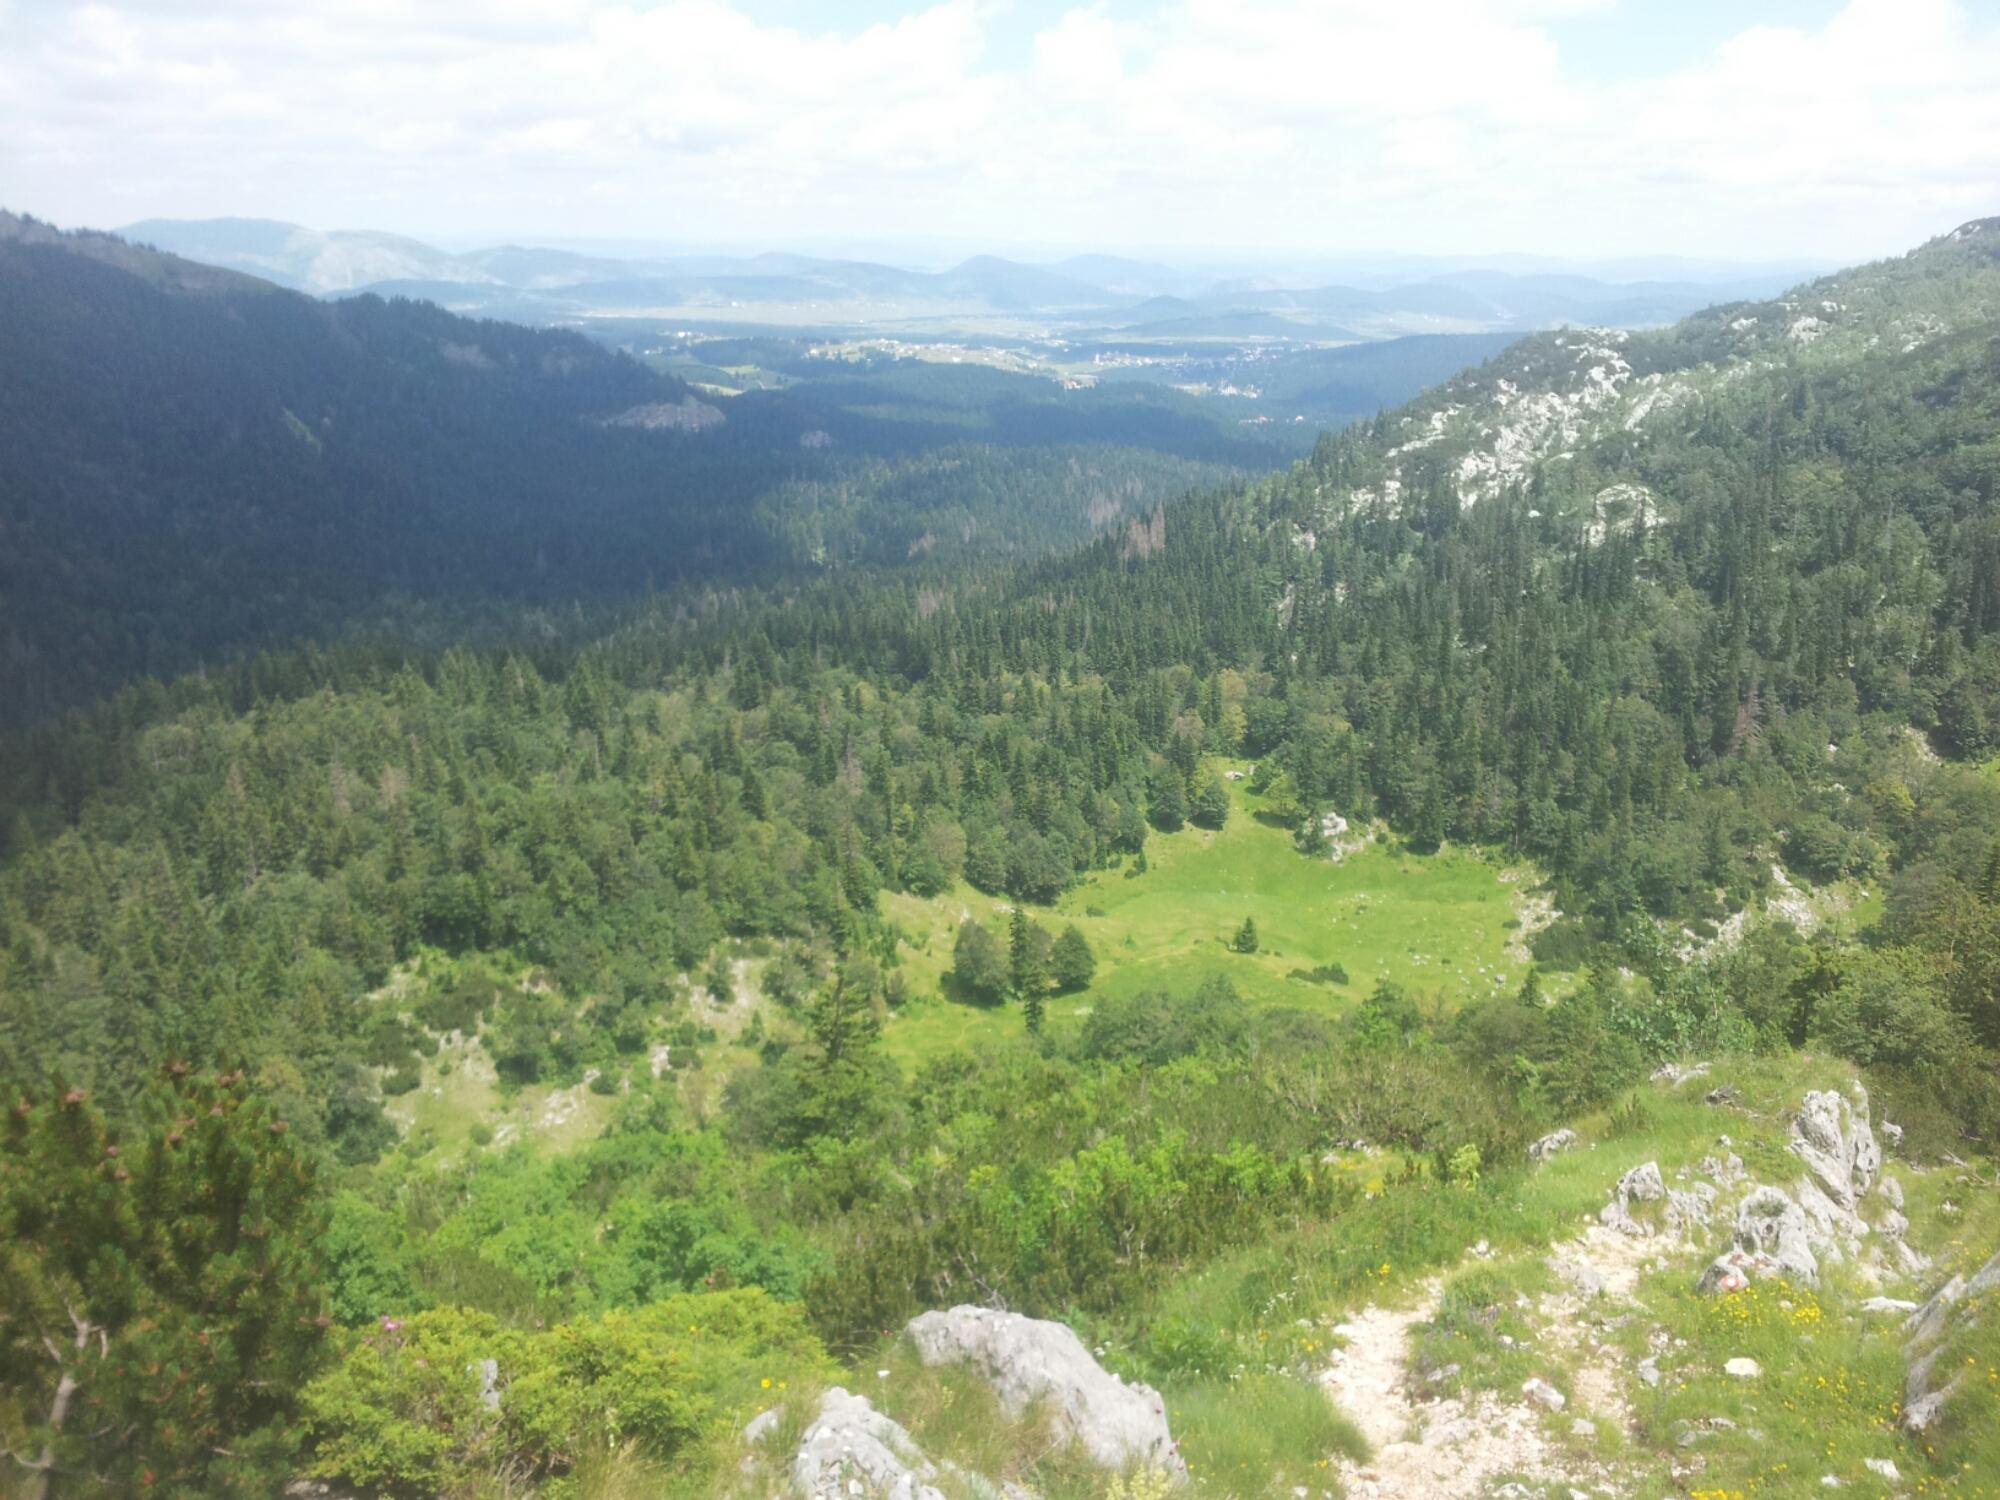 Crepulj Poljana Durmitor Žabljak Crna Gora | Hiking Via Dinarica Montenegro